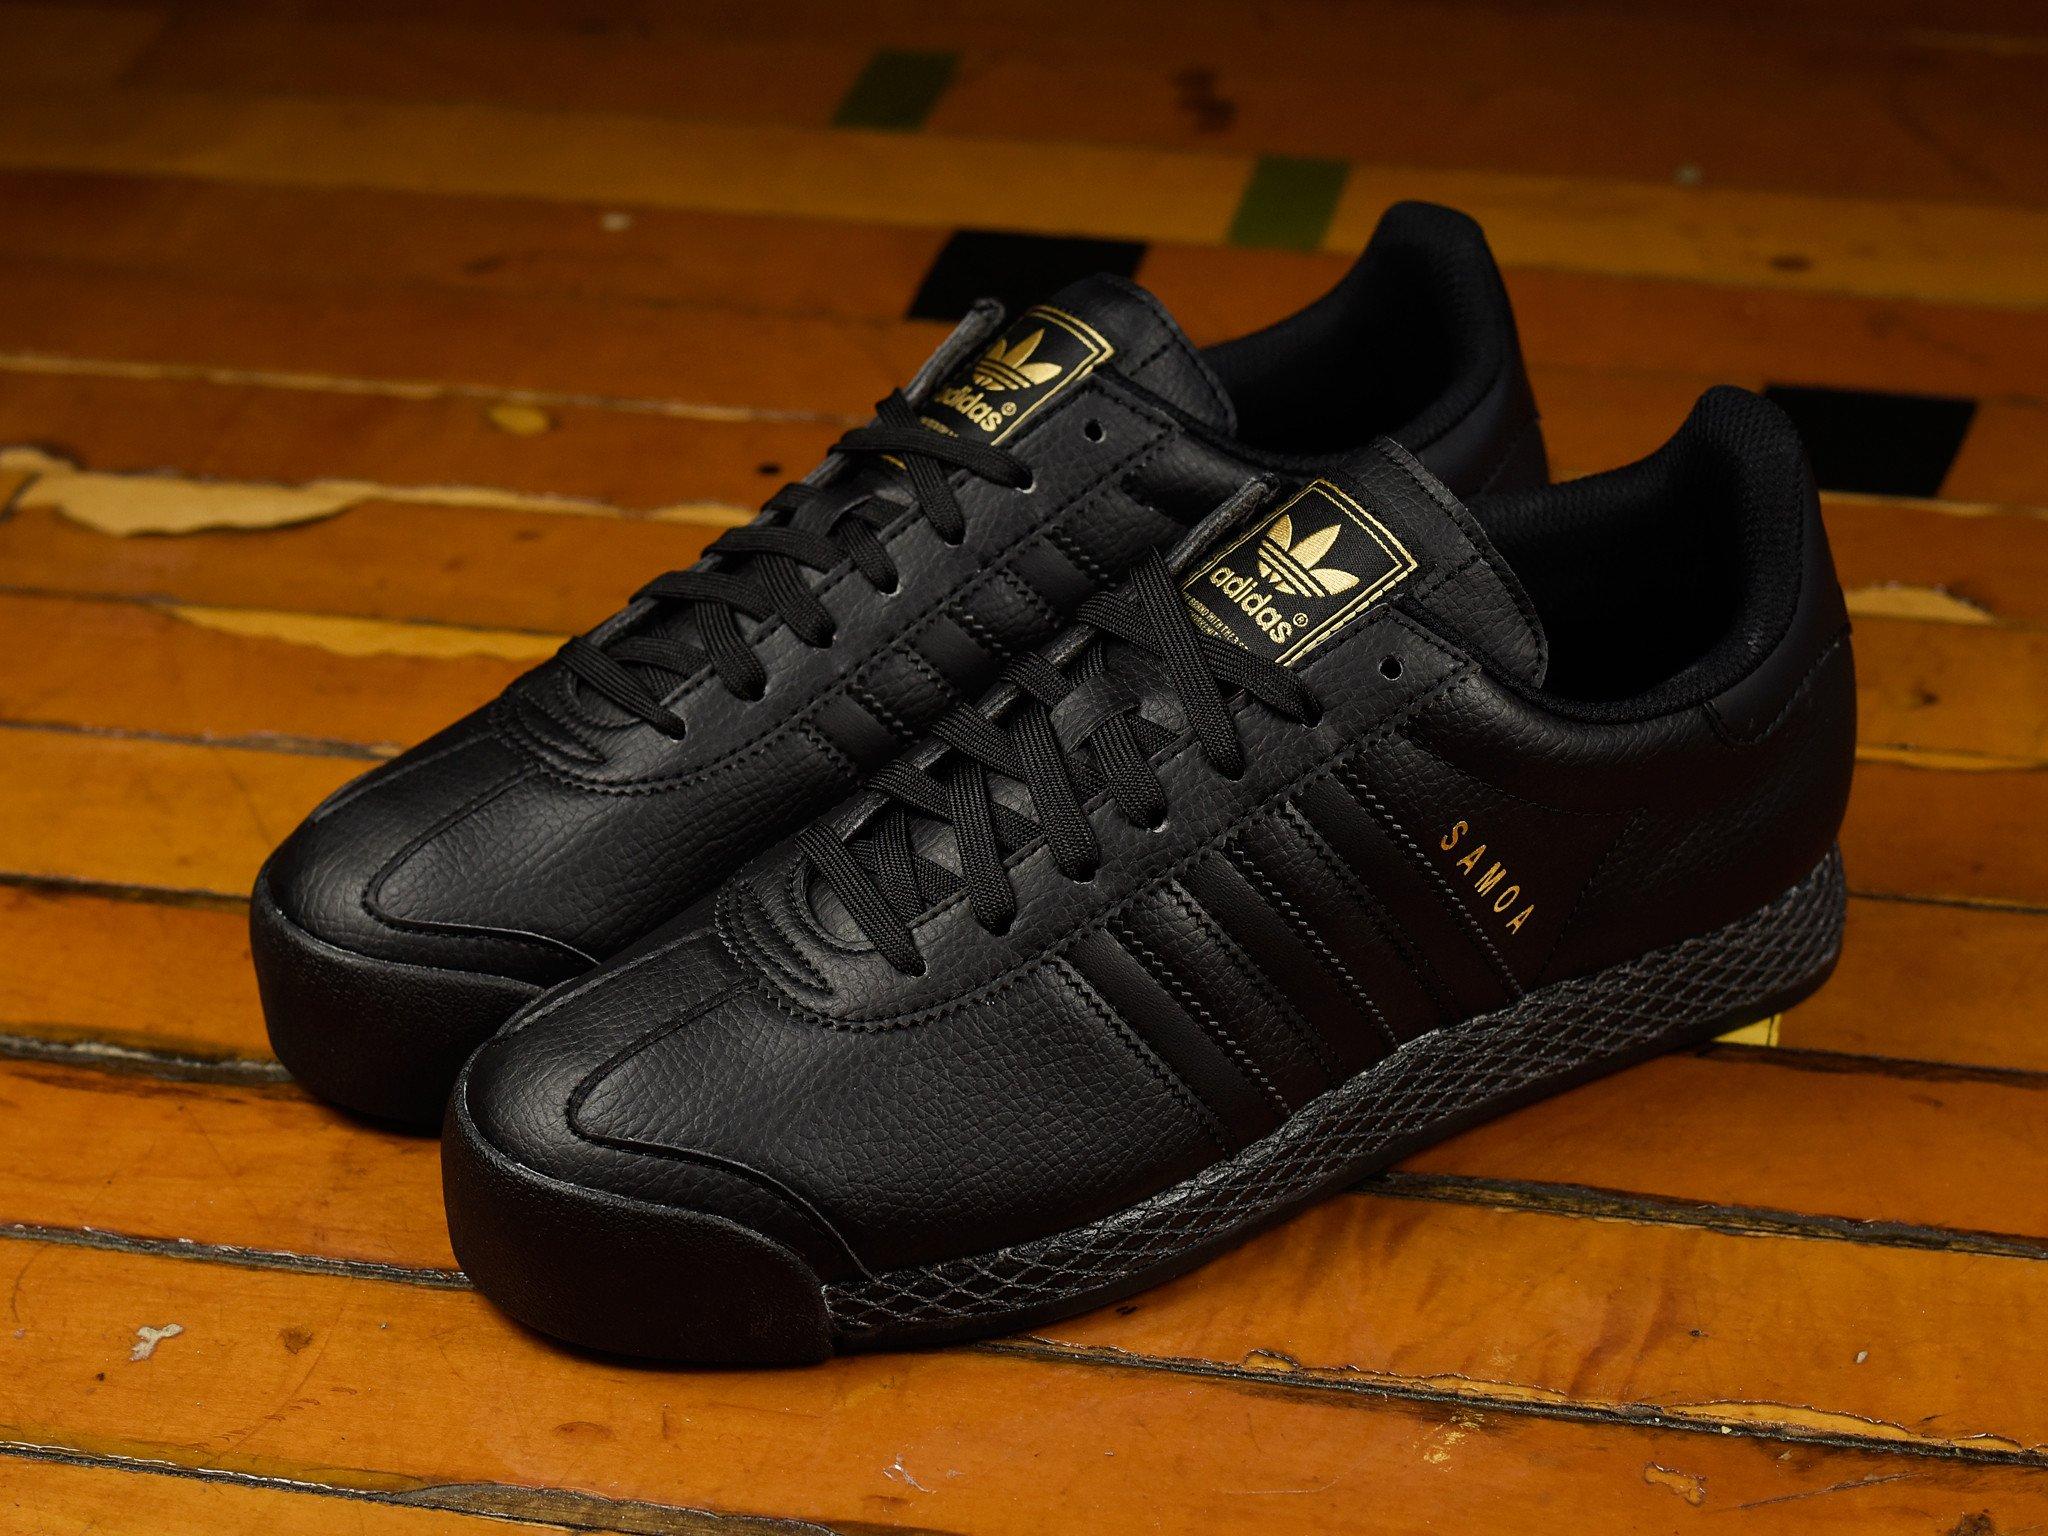 ADIDAS SAMOA ORIGINAL 經典款 黑金配色 男鞋 US 7.5~10 F37598 E倉